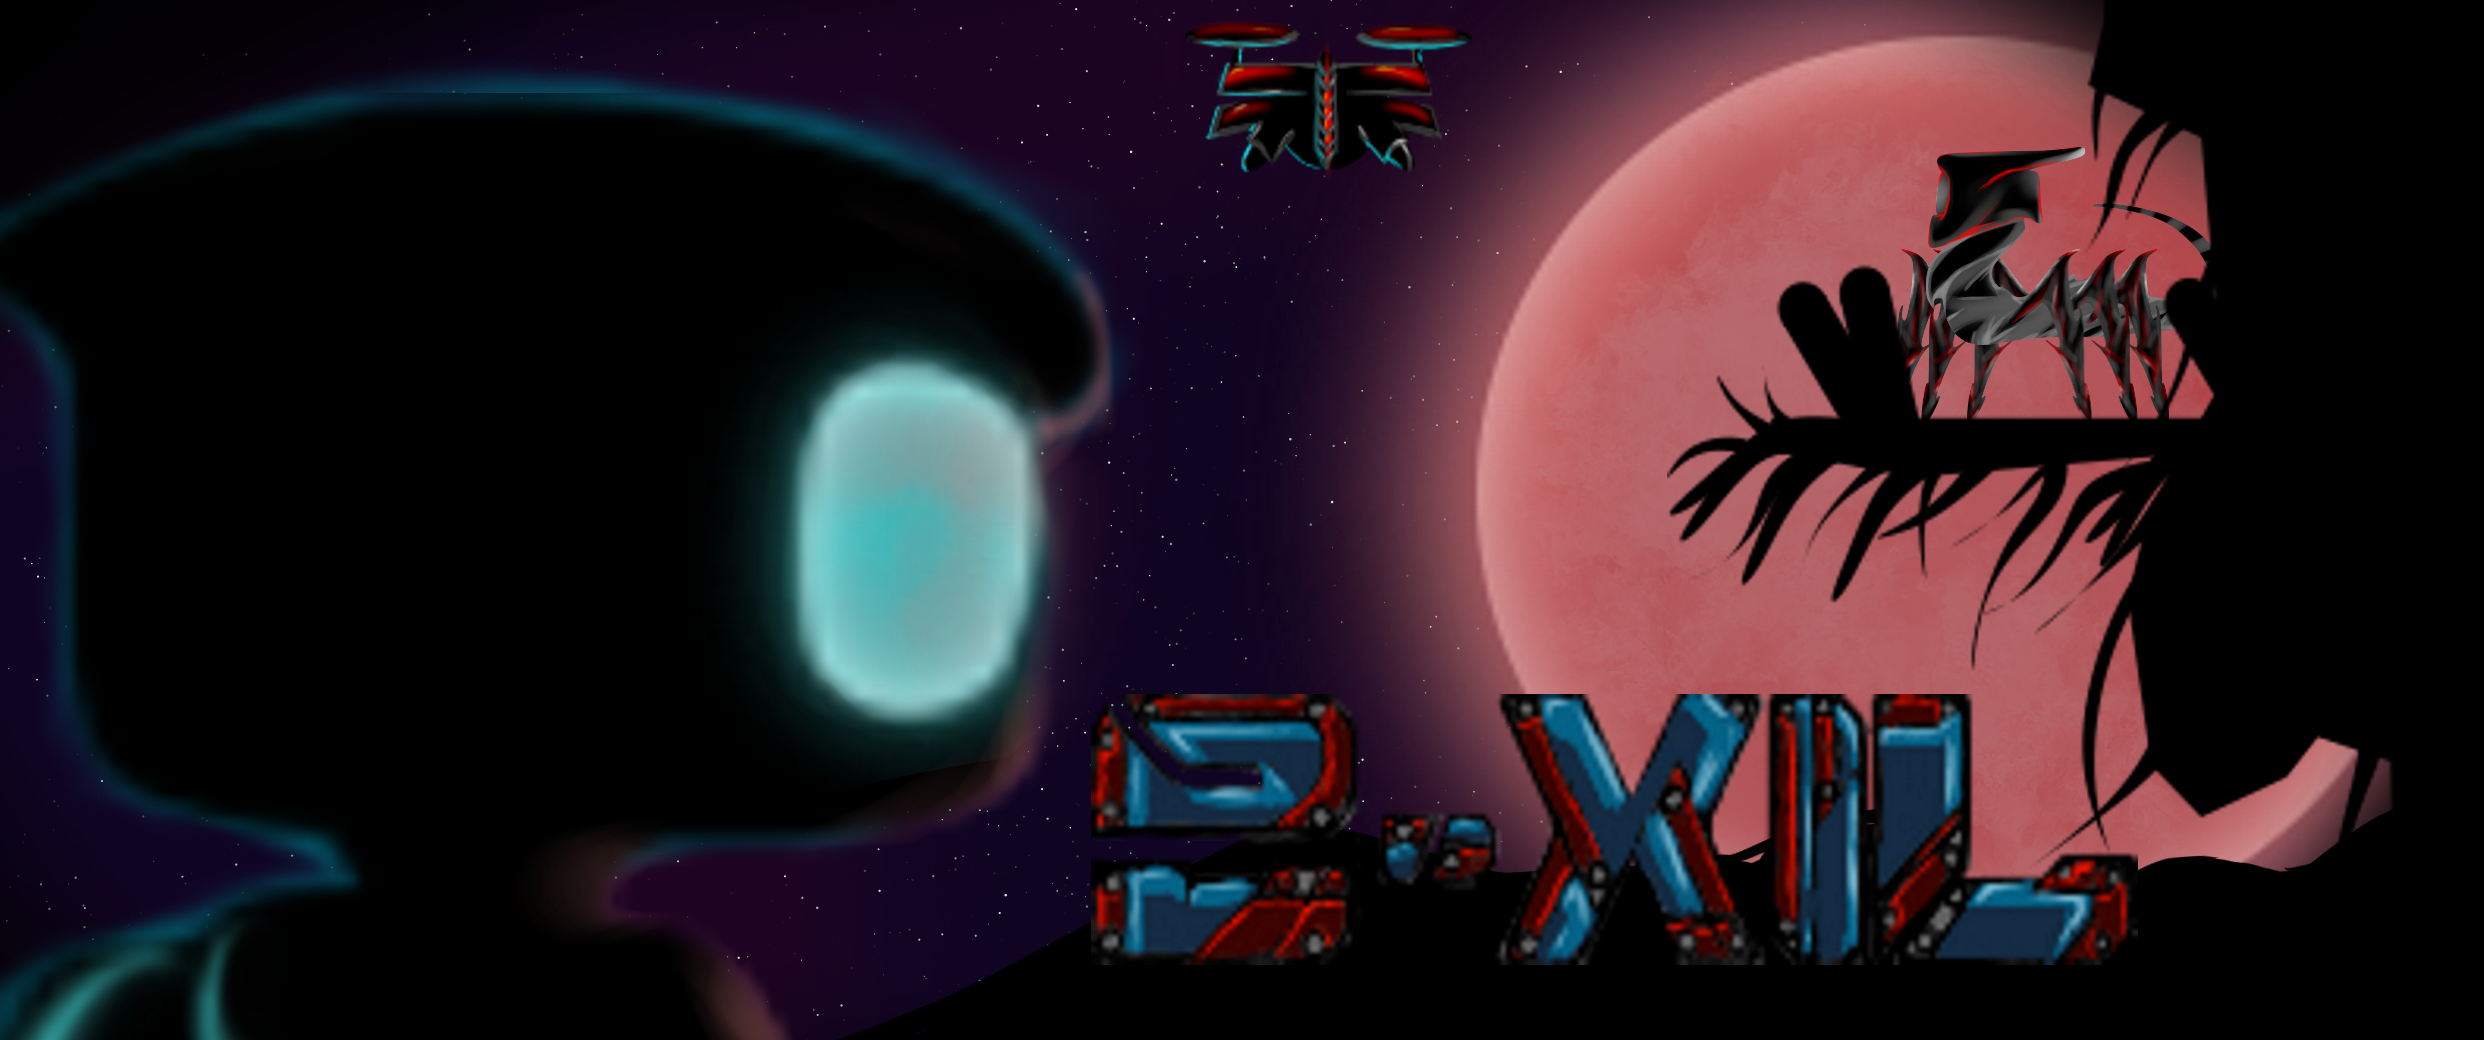 E-xil (FR) - Démo Kickstarter